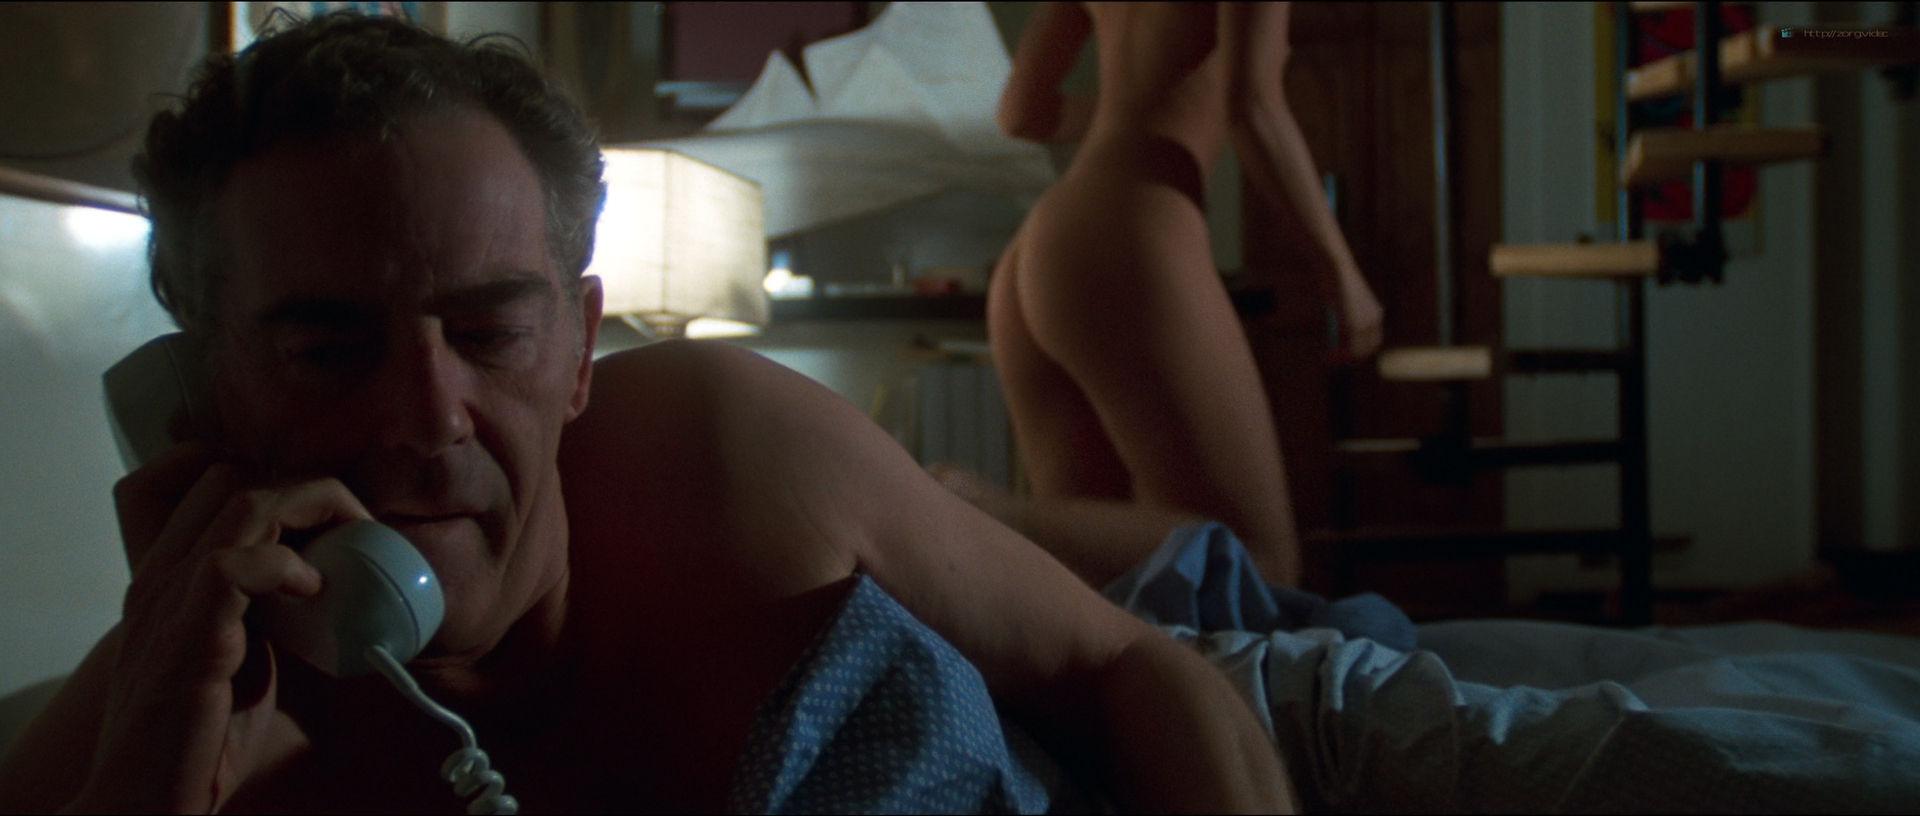 Daniela Doria nude full frontal Zora Kerova and other nude - The New York Ripper (IT-1982) HD 1080p BluRay(r) (9)